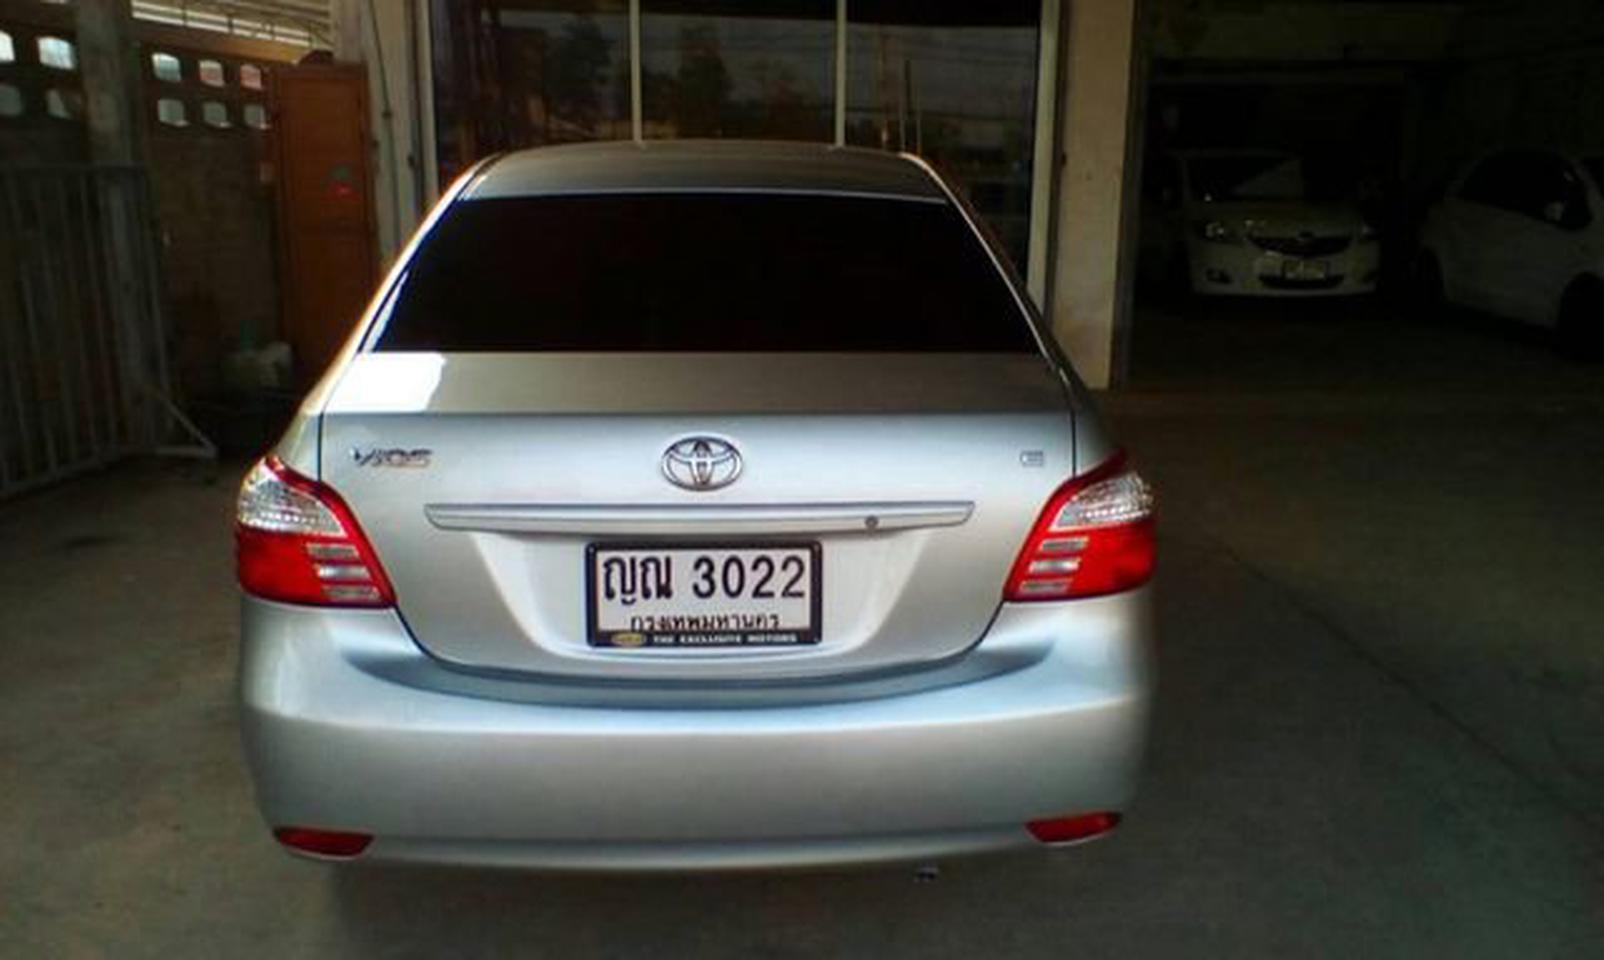 Toyota vios 1.5 Ev ปี2011 รถสวย นางฟ้า มีของแถม รูปที่ 3